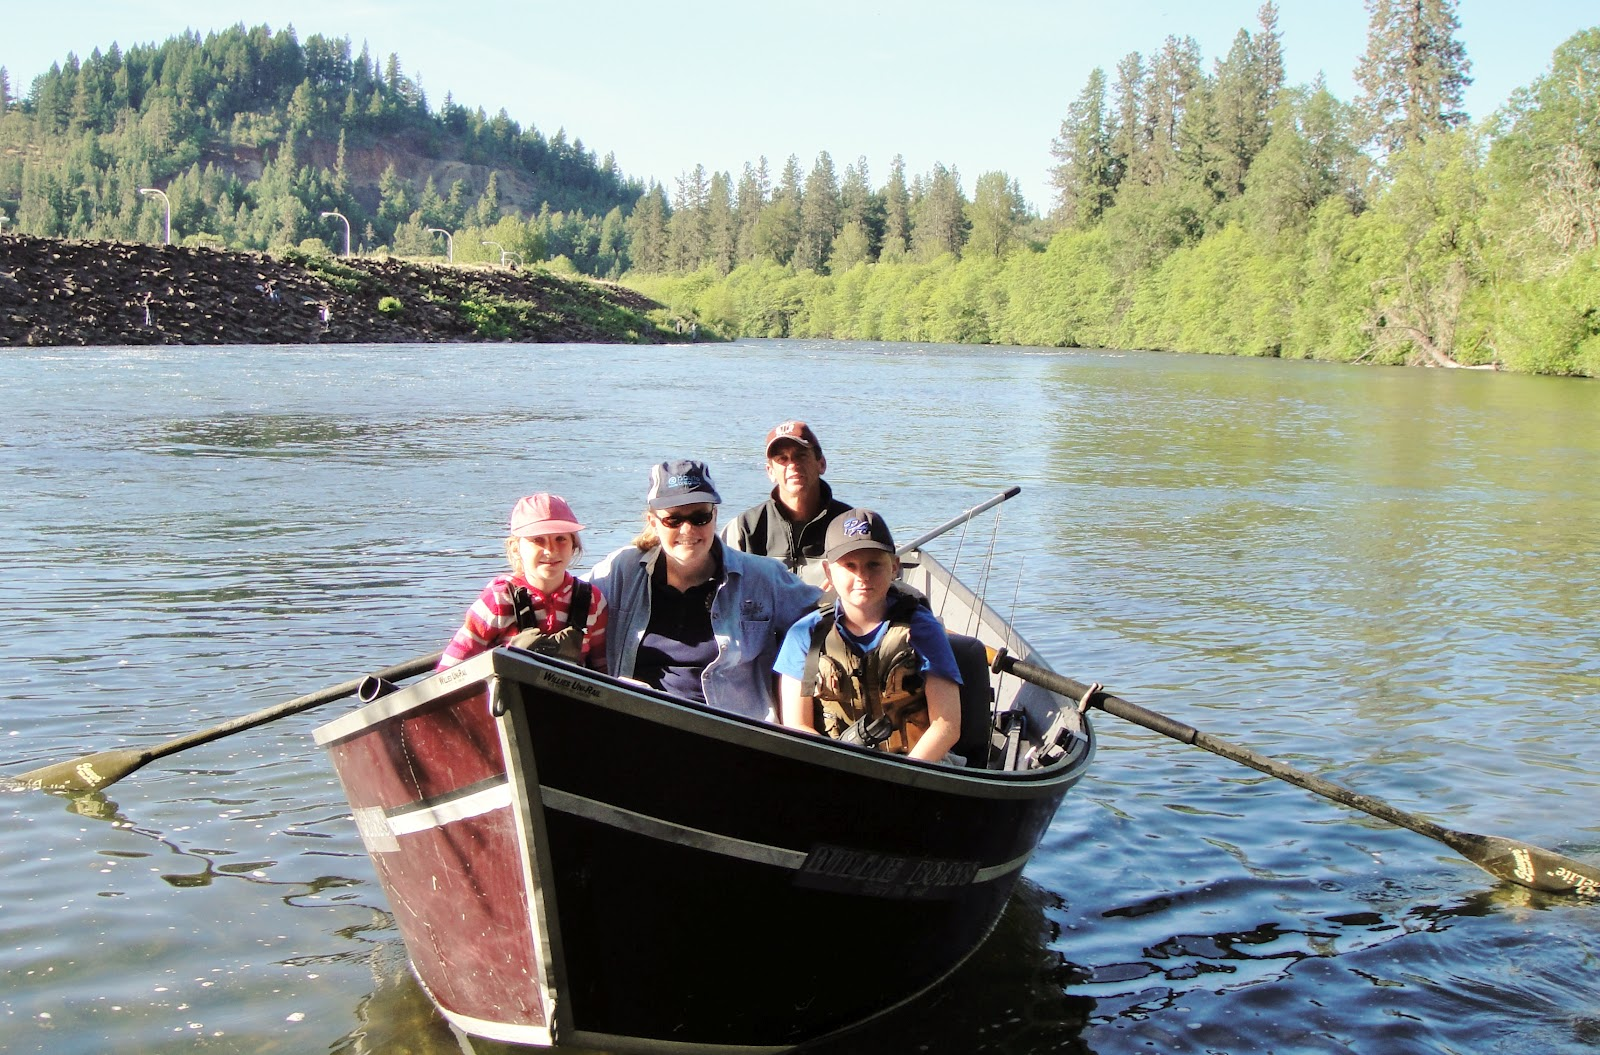 Summer vacation summer steelhead rogue river fishing for Rogue river oregon fishing